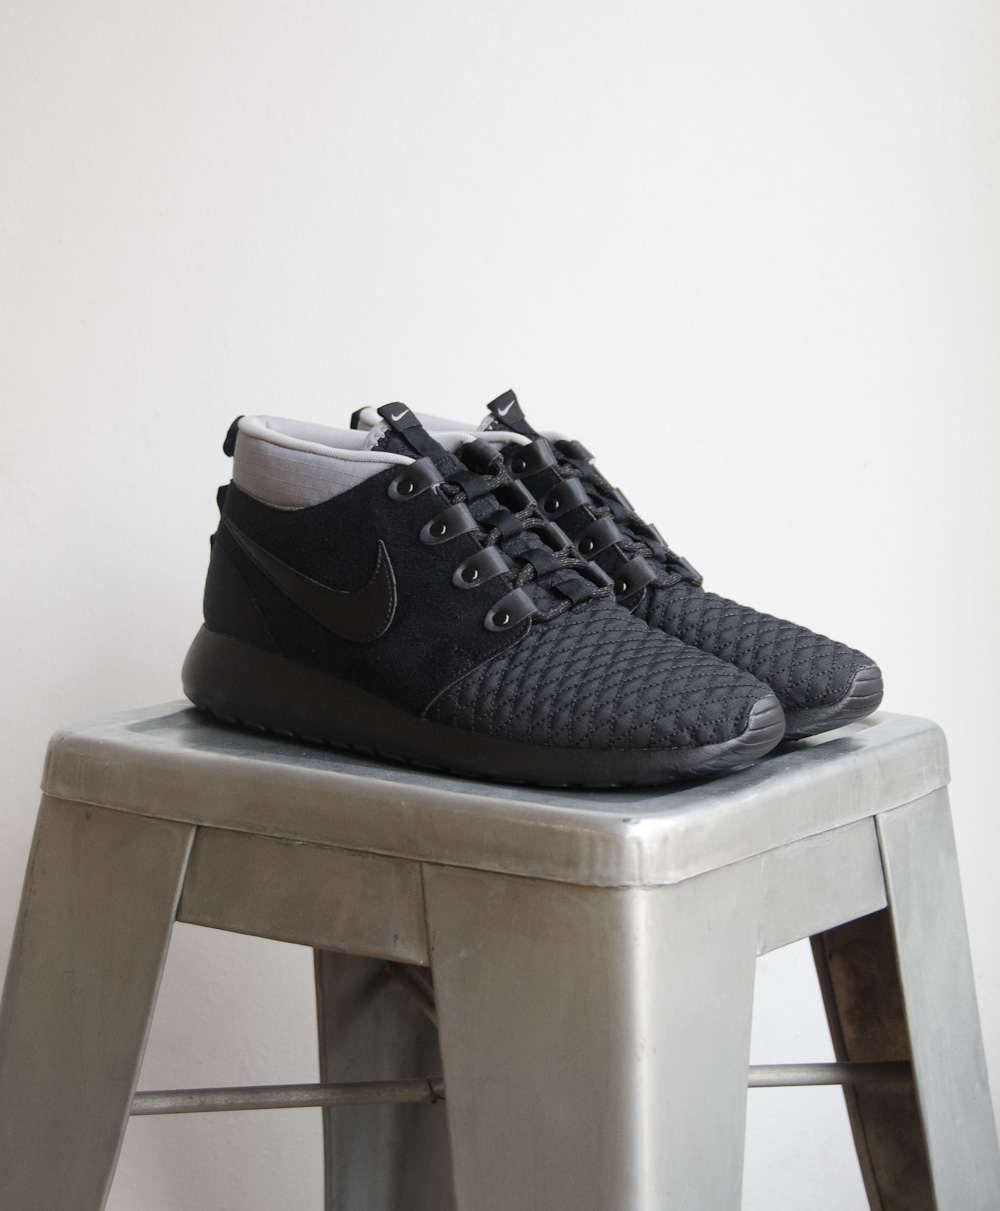 sneakerboot-premium-picks.jpg